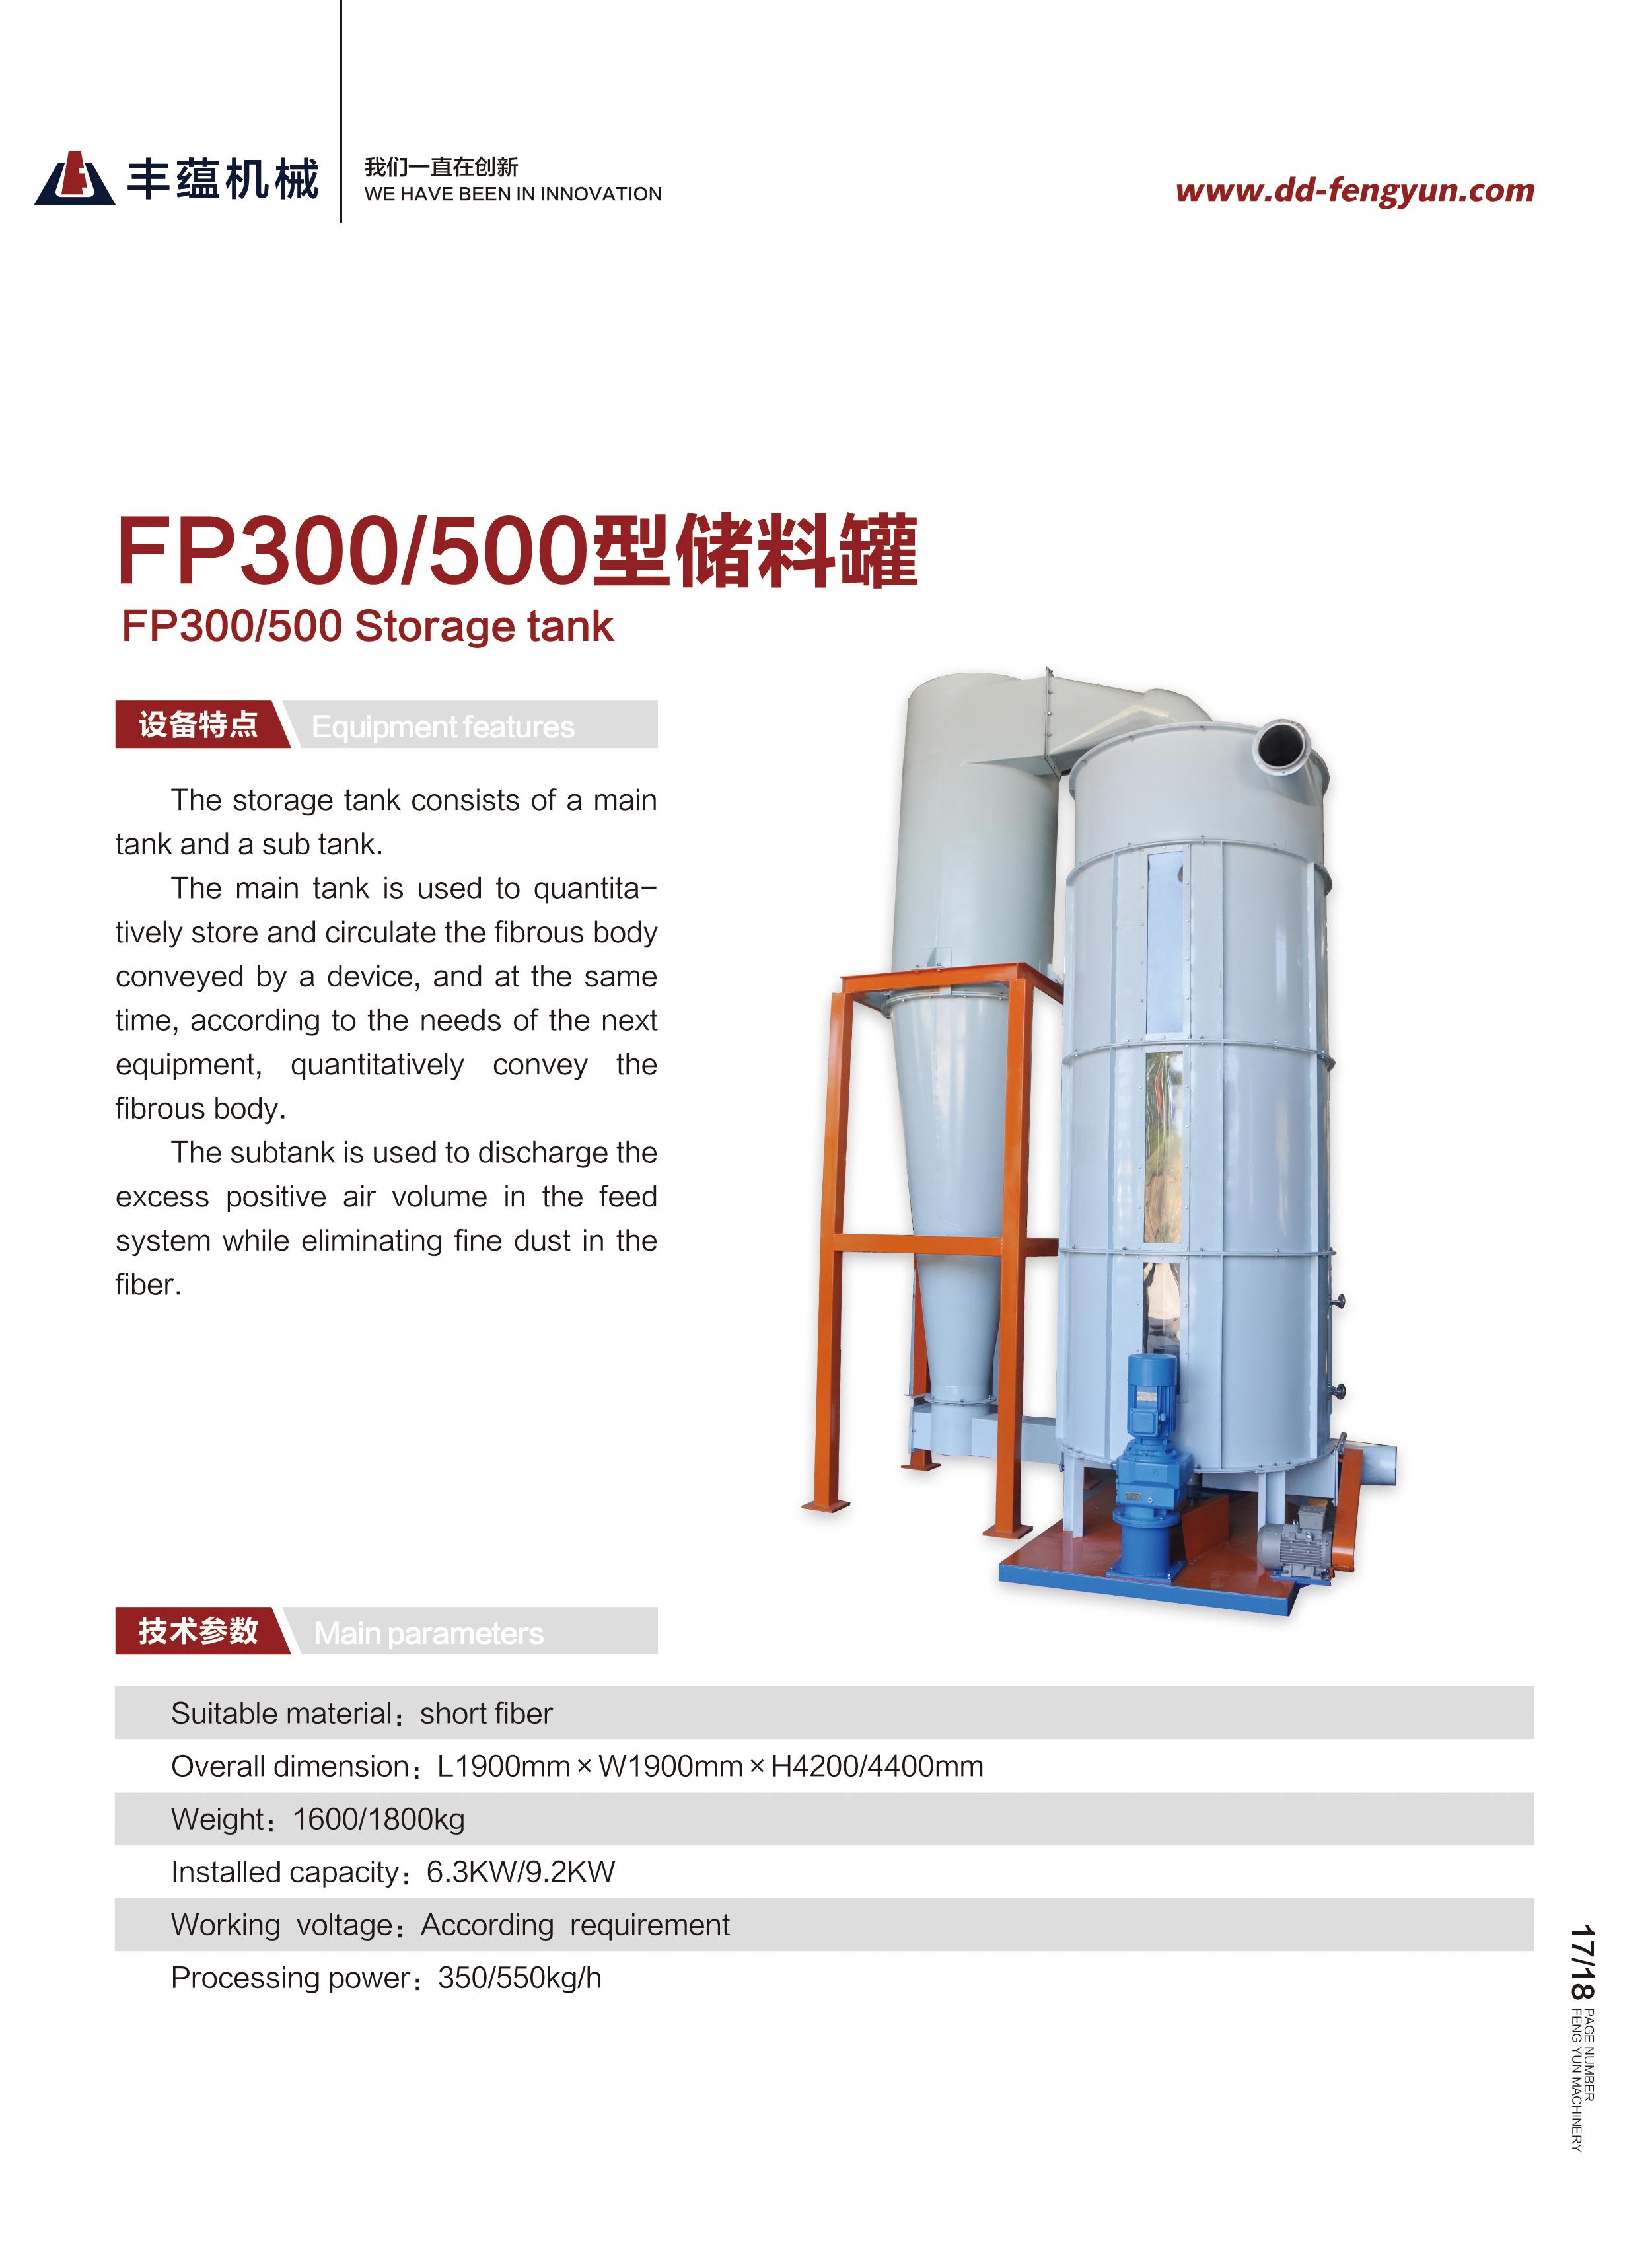 FP300/500型木浆粉碎系统